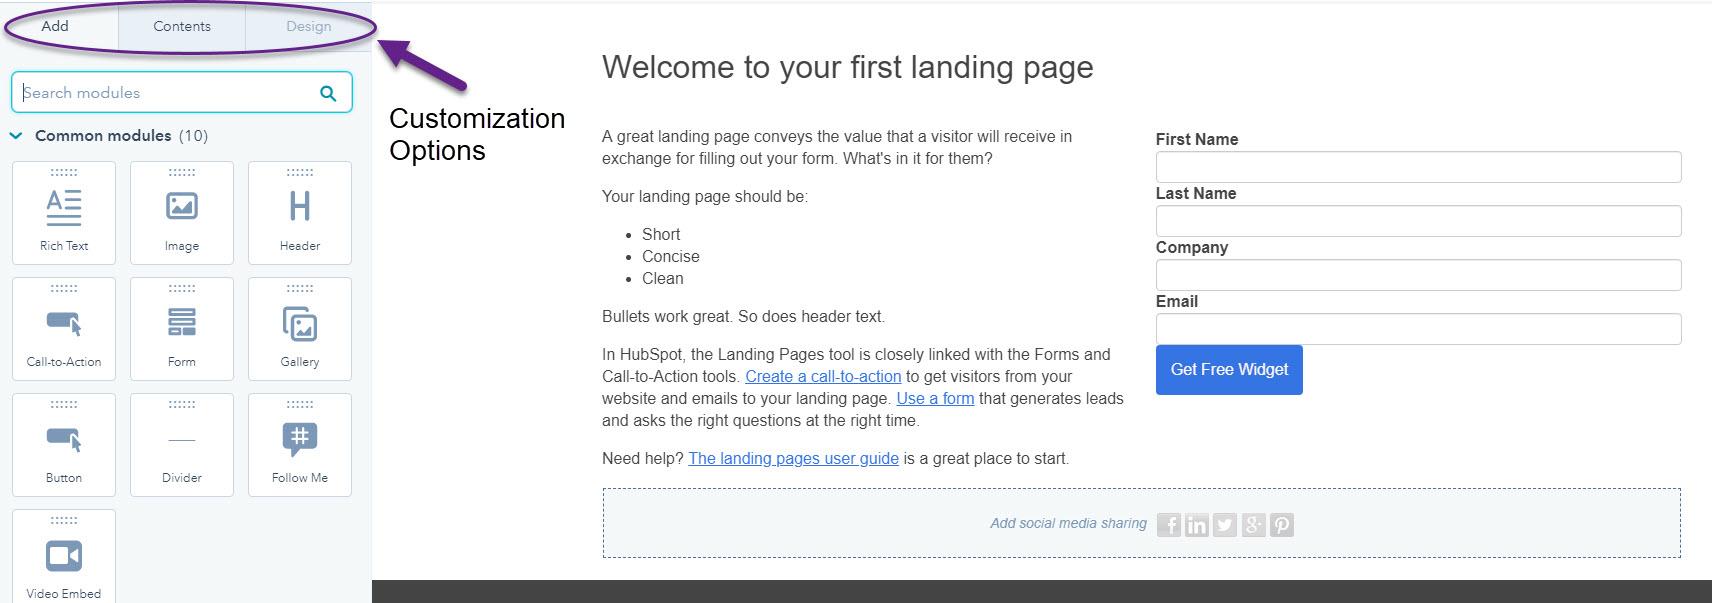 HubSpot Landing Page Creation